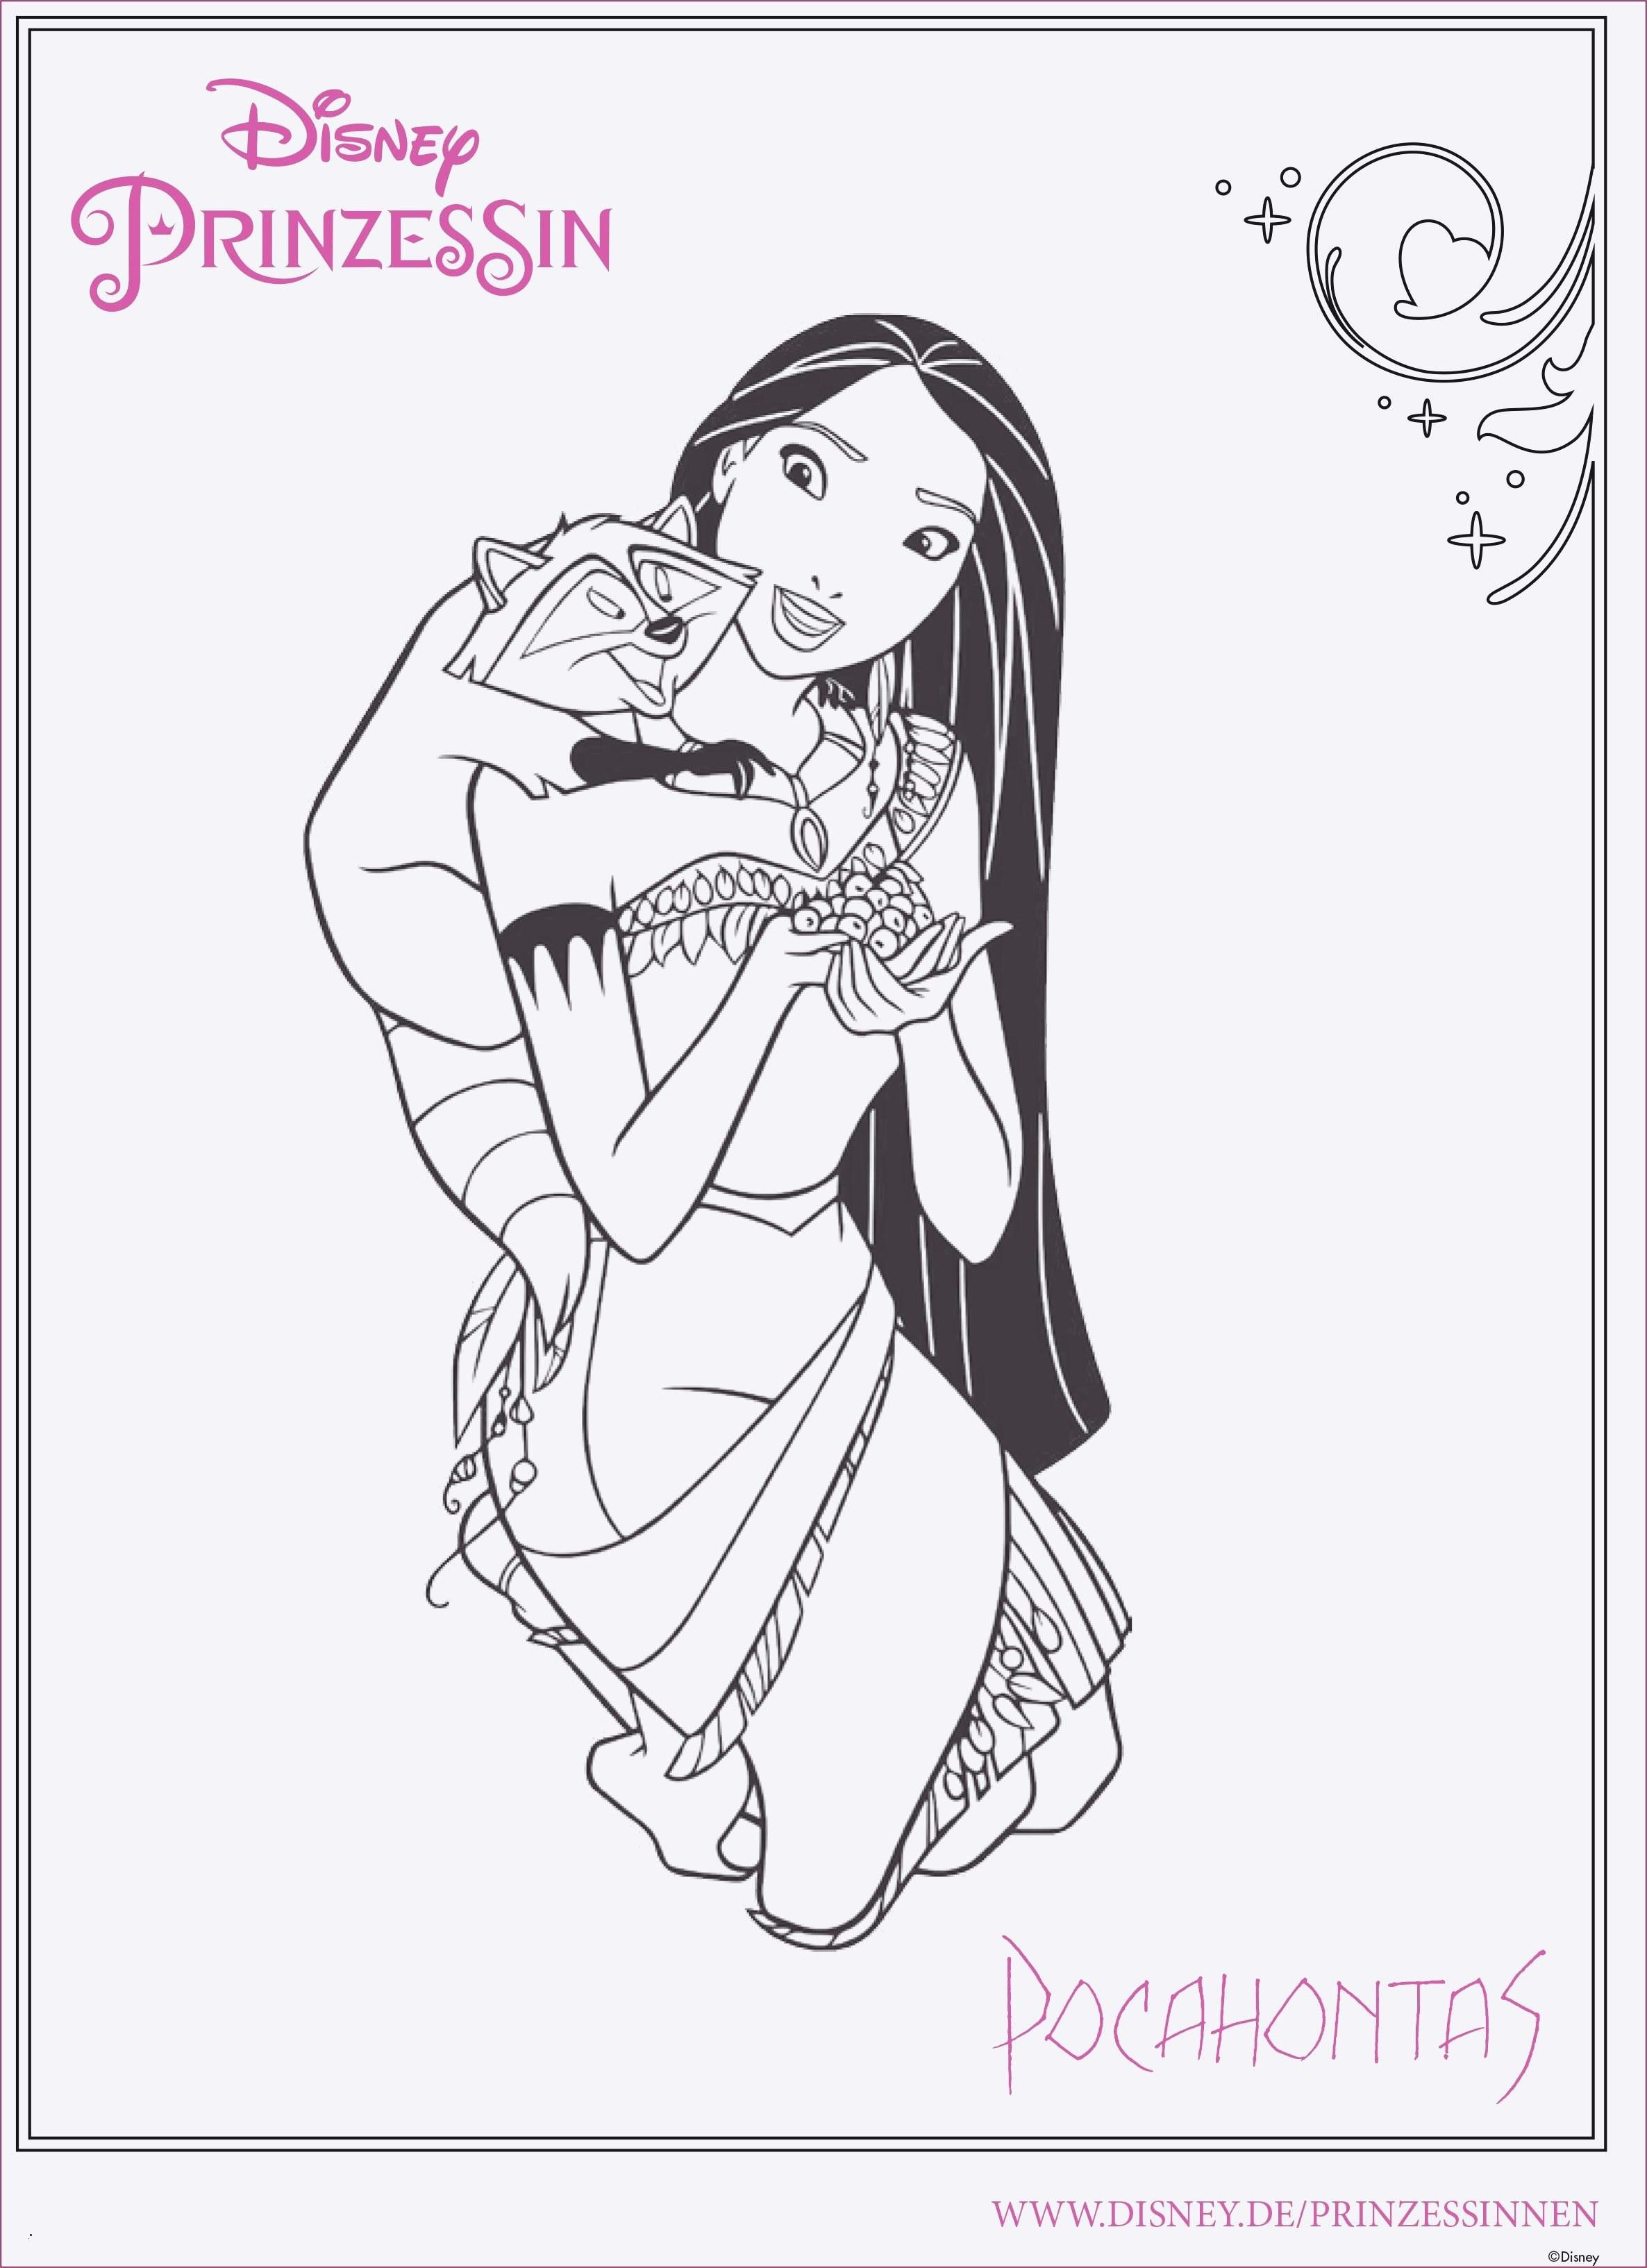 Ausmalbilder Disney Prinzessin Jasmin Genial 40 Das Konzept Von Disney Princess Ausmalbilder Treehouse Nyc Fotografieren